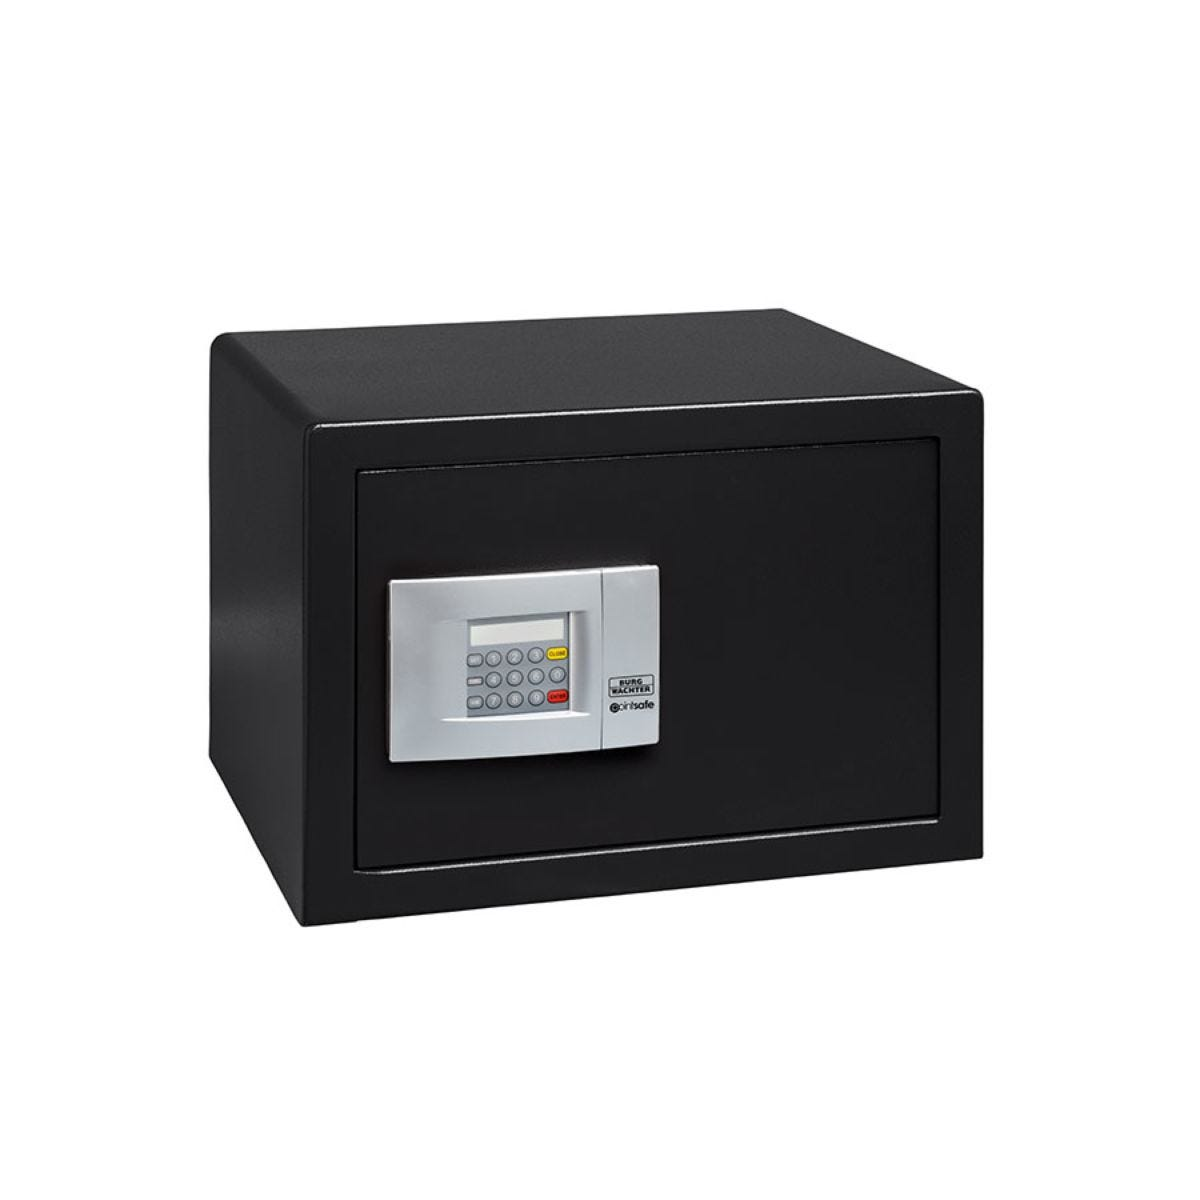 Burg-Wachter PointSafe Electronic Safe – 38.8L